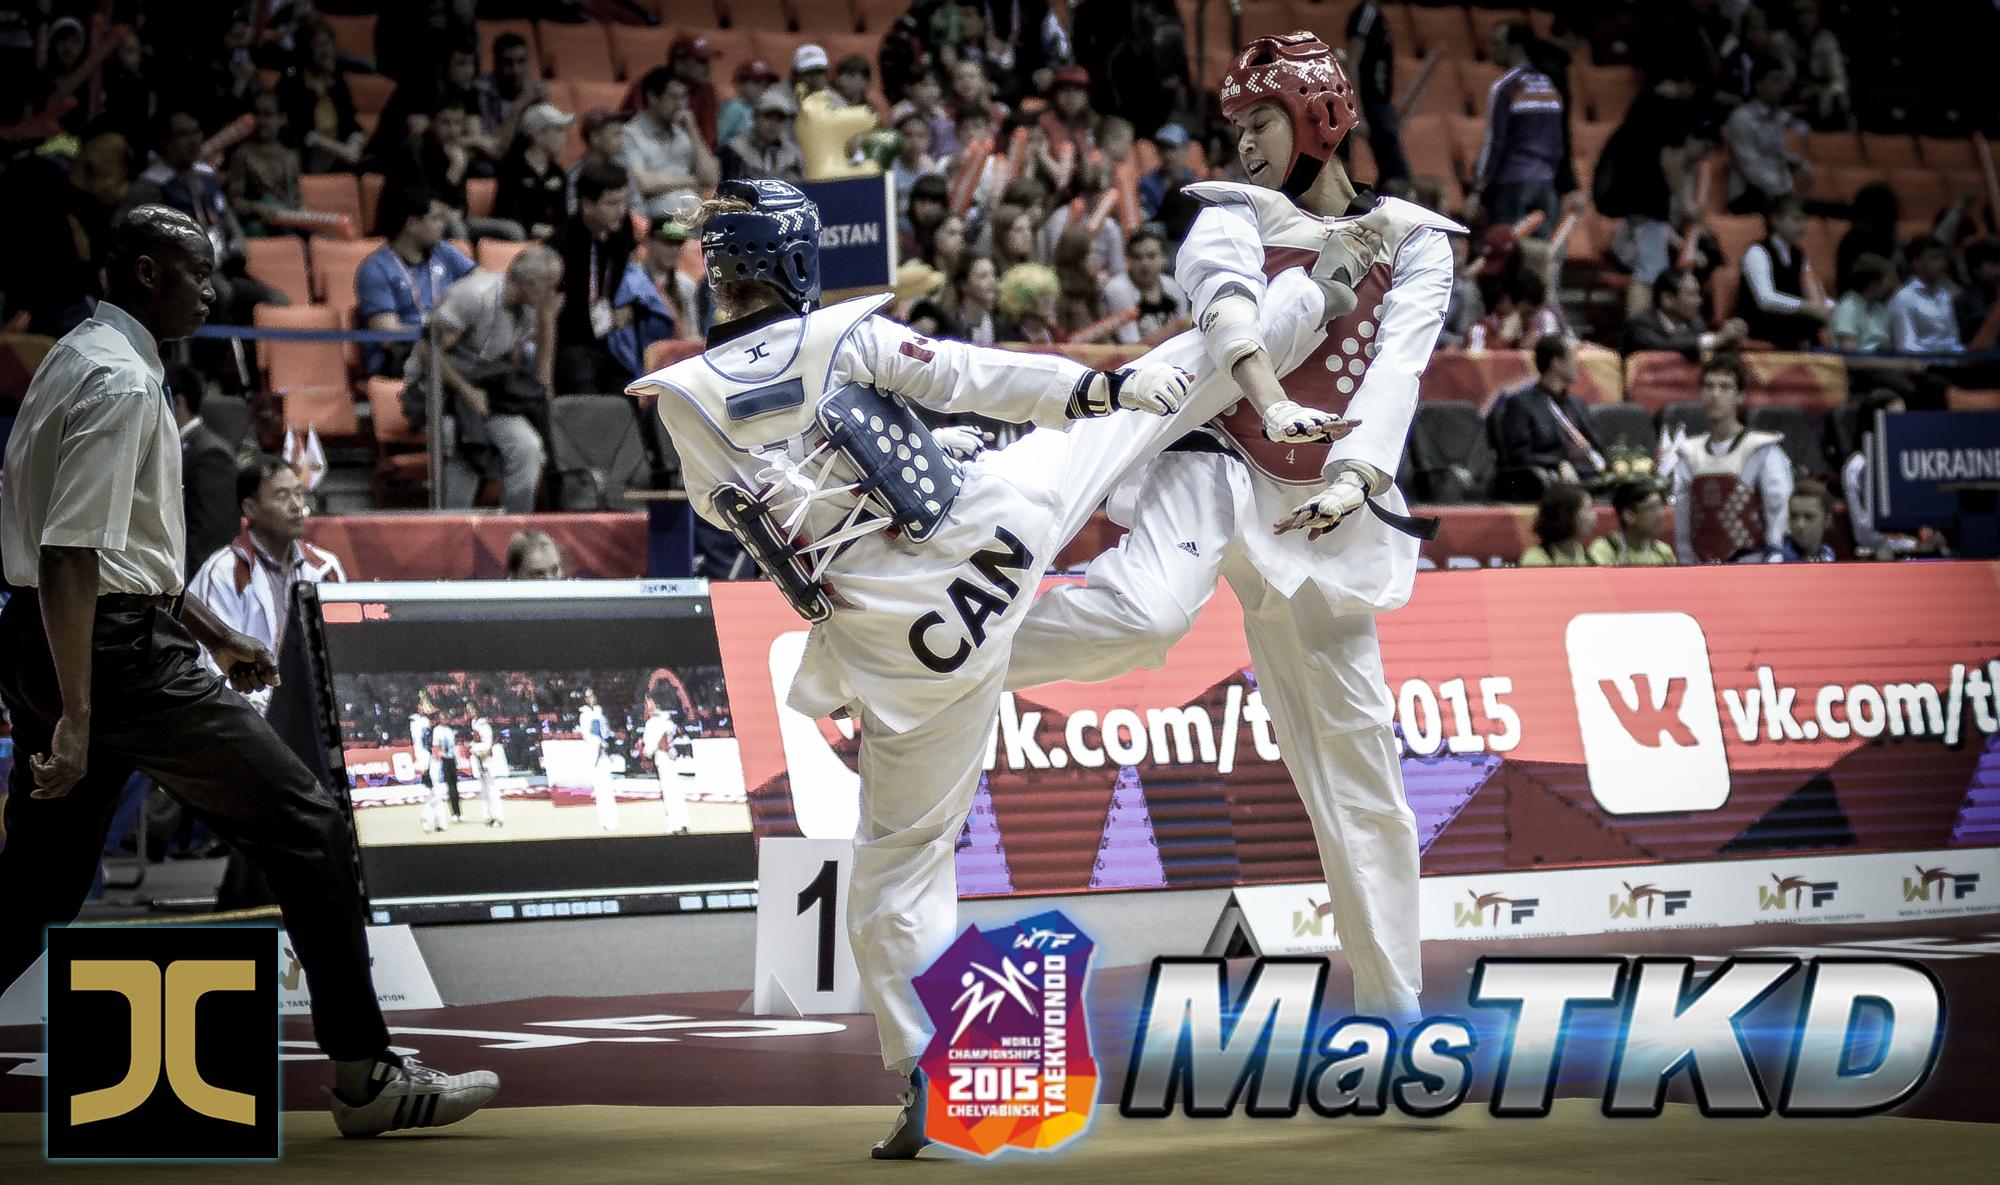 0_JCalicu-Mundial-Taekwondo-Mejores-Imagenes